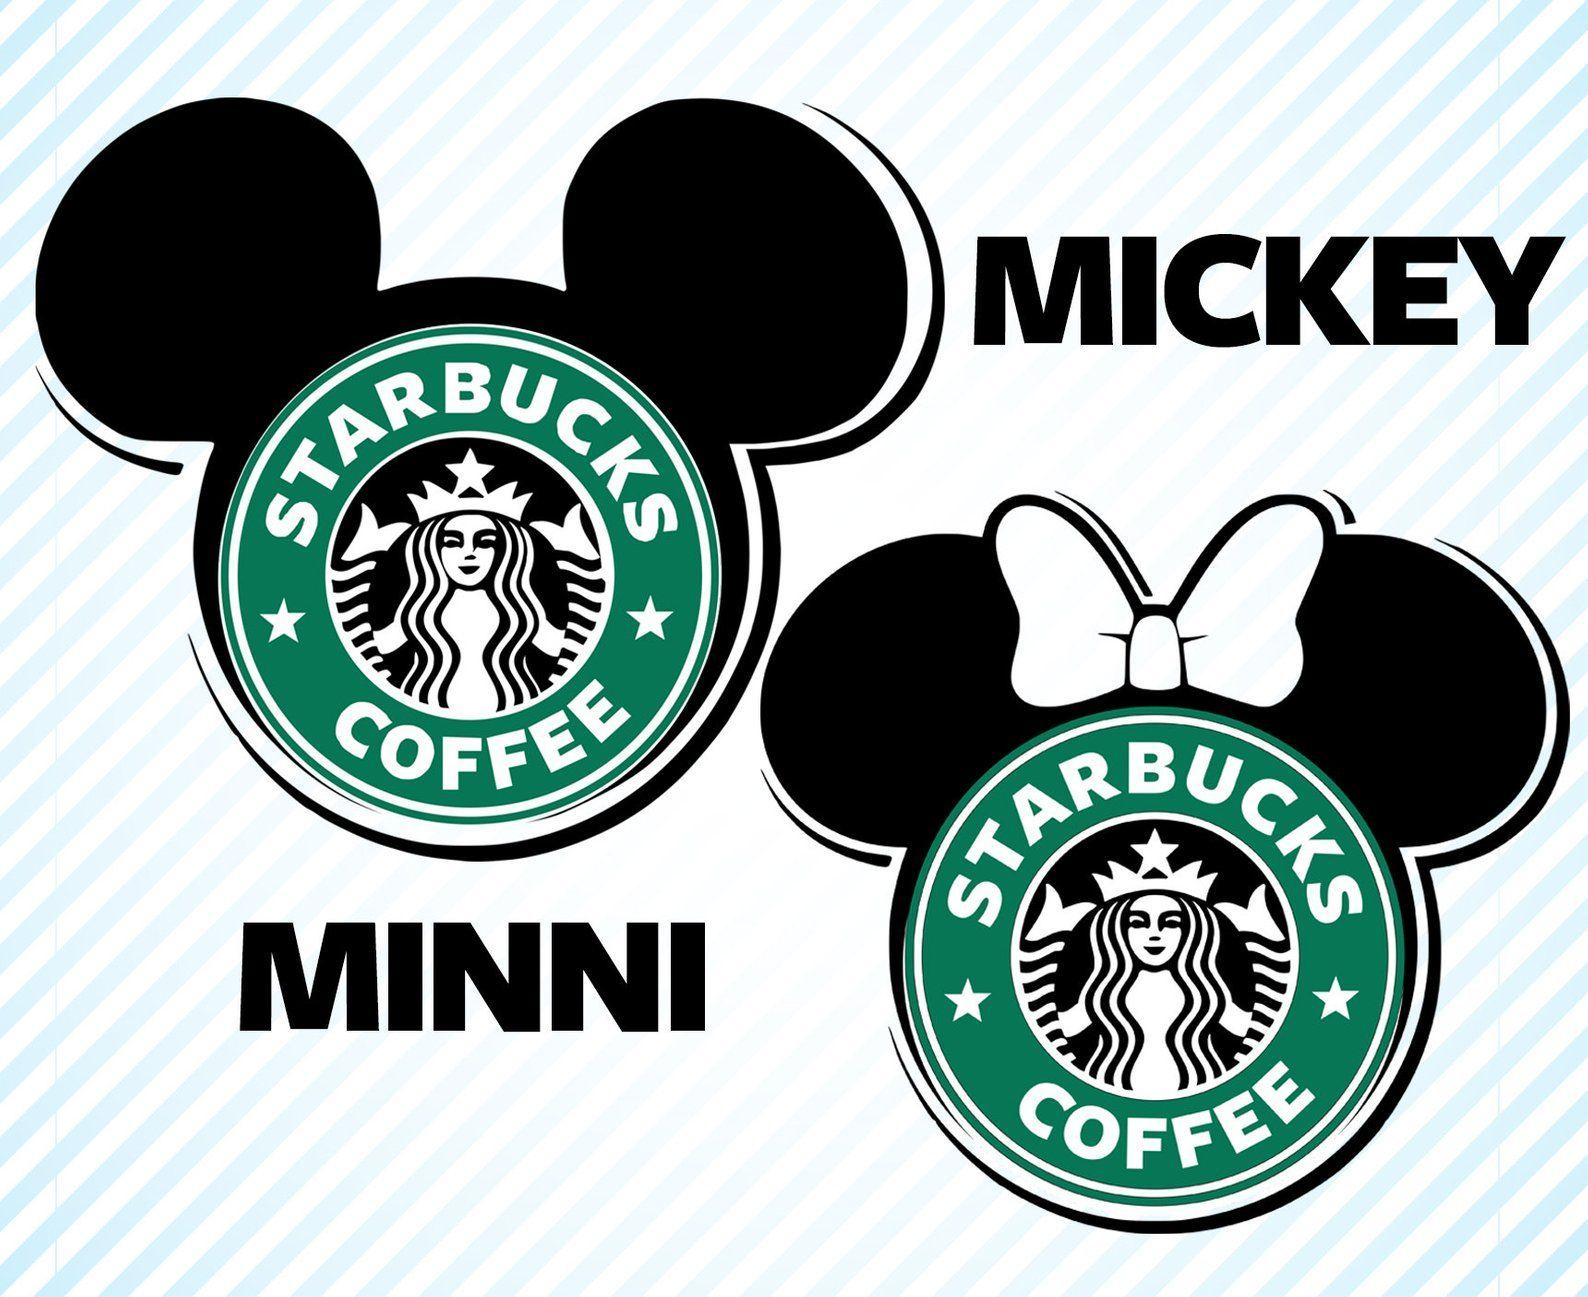 Starbucks Svg Disney Starbucks Svg File Starbucks Svg Files Etsy Disney Starbucks Starbucks Logo Starbucks Cups